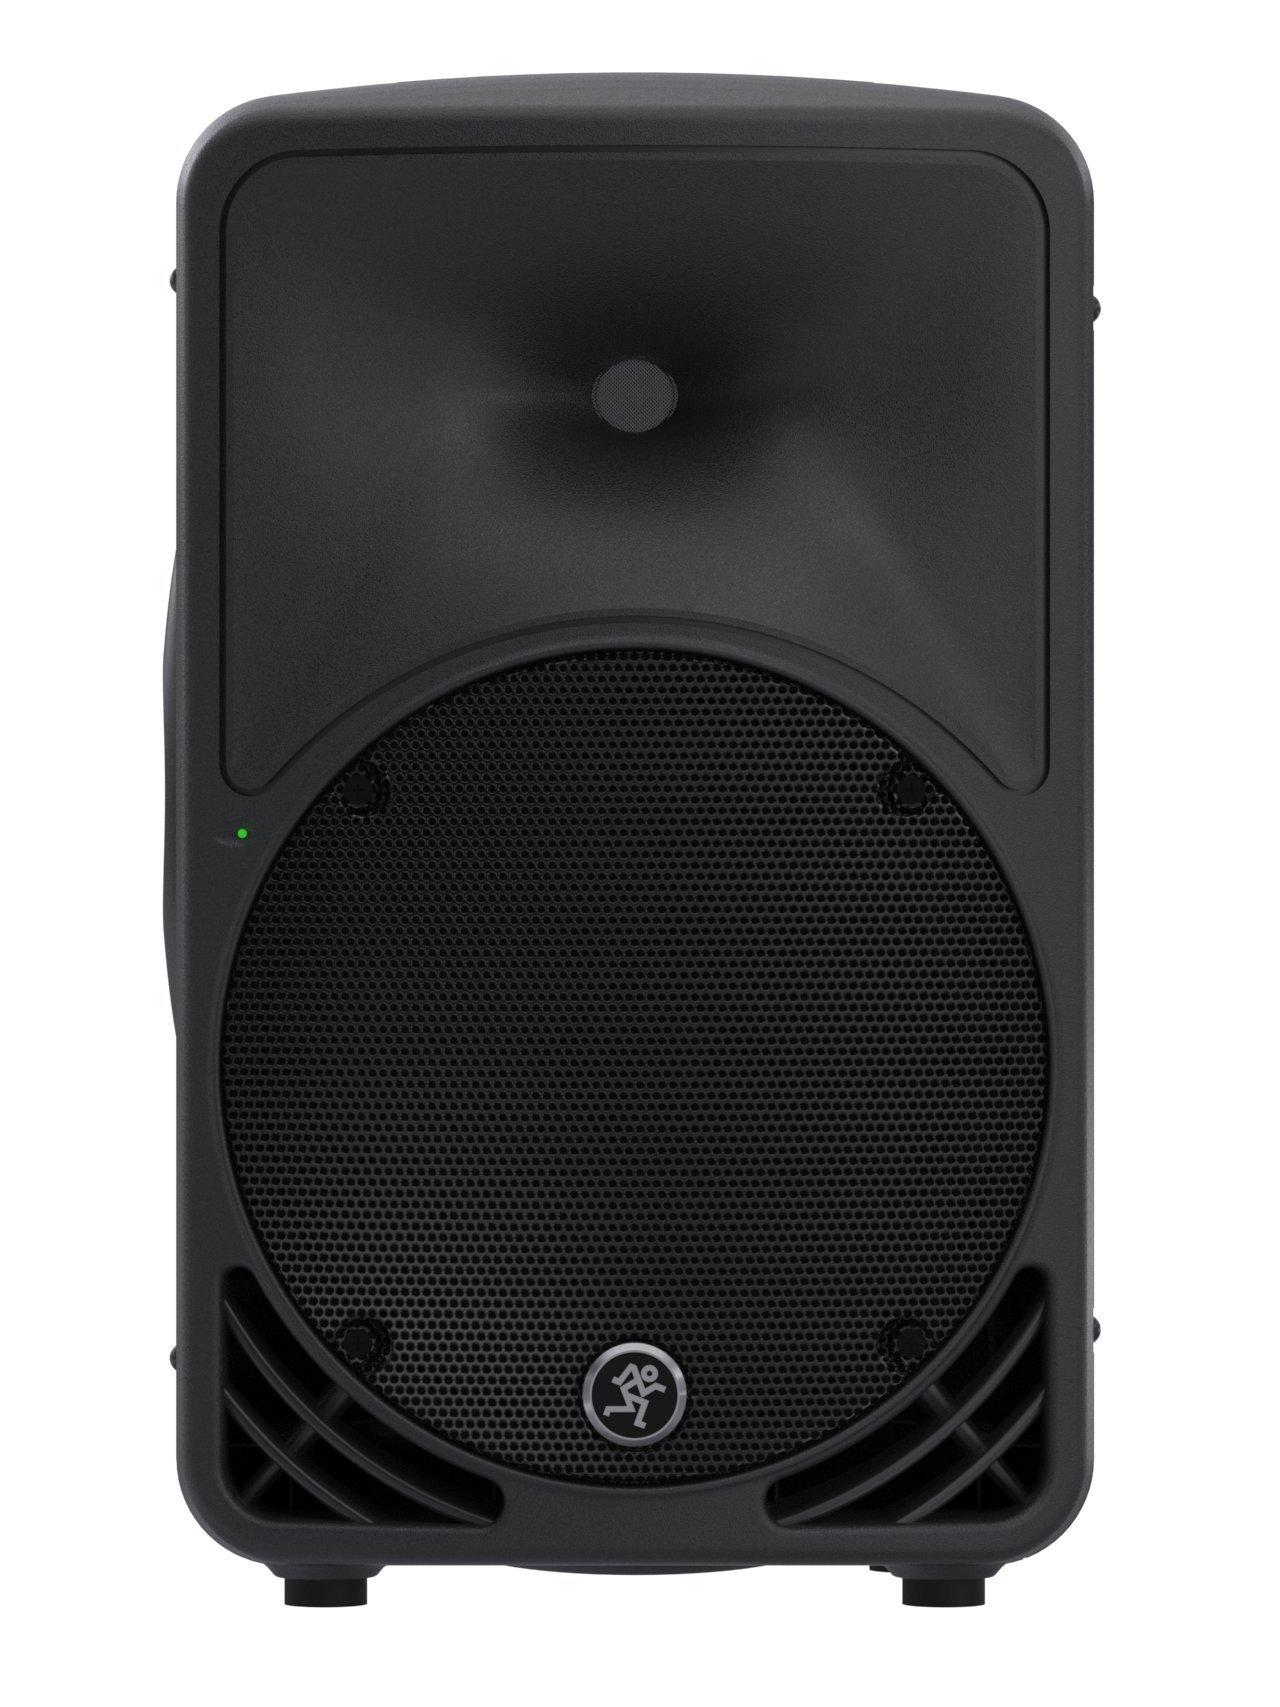 Mackie SRM350v3 1000 Watts 10'' High-Definition Portable Powered Loudspeaker, Black by Mackie